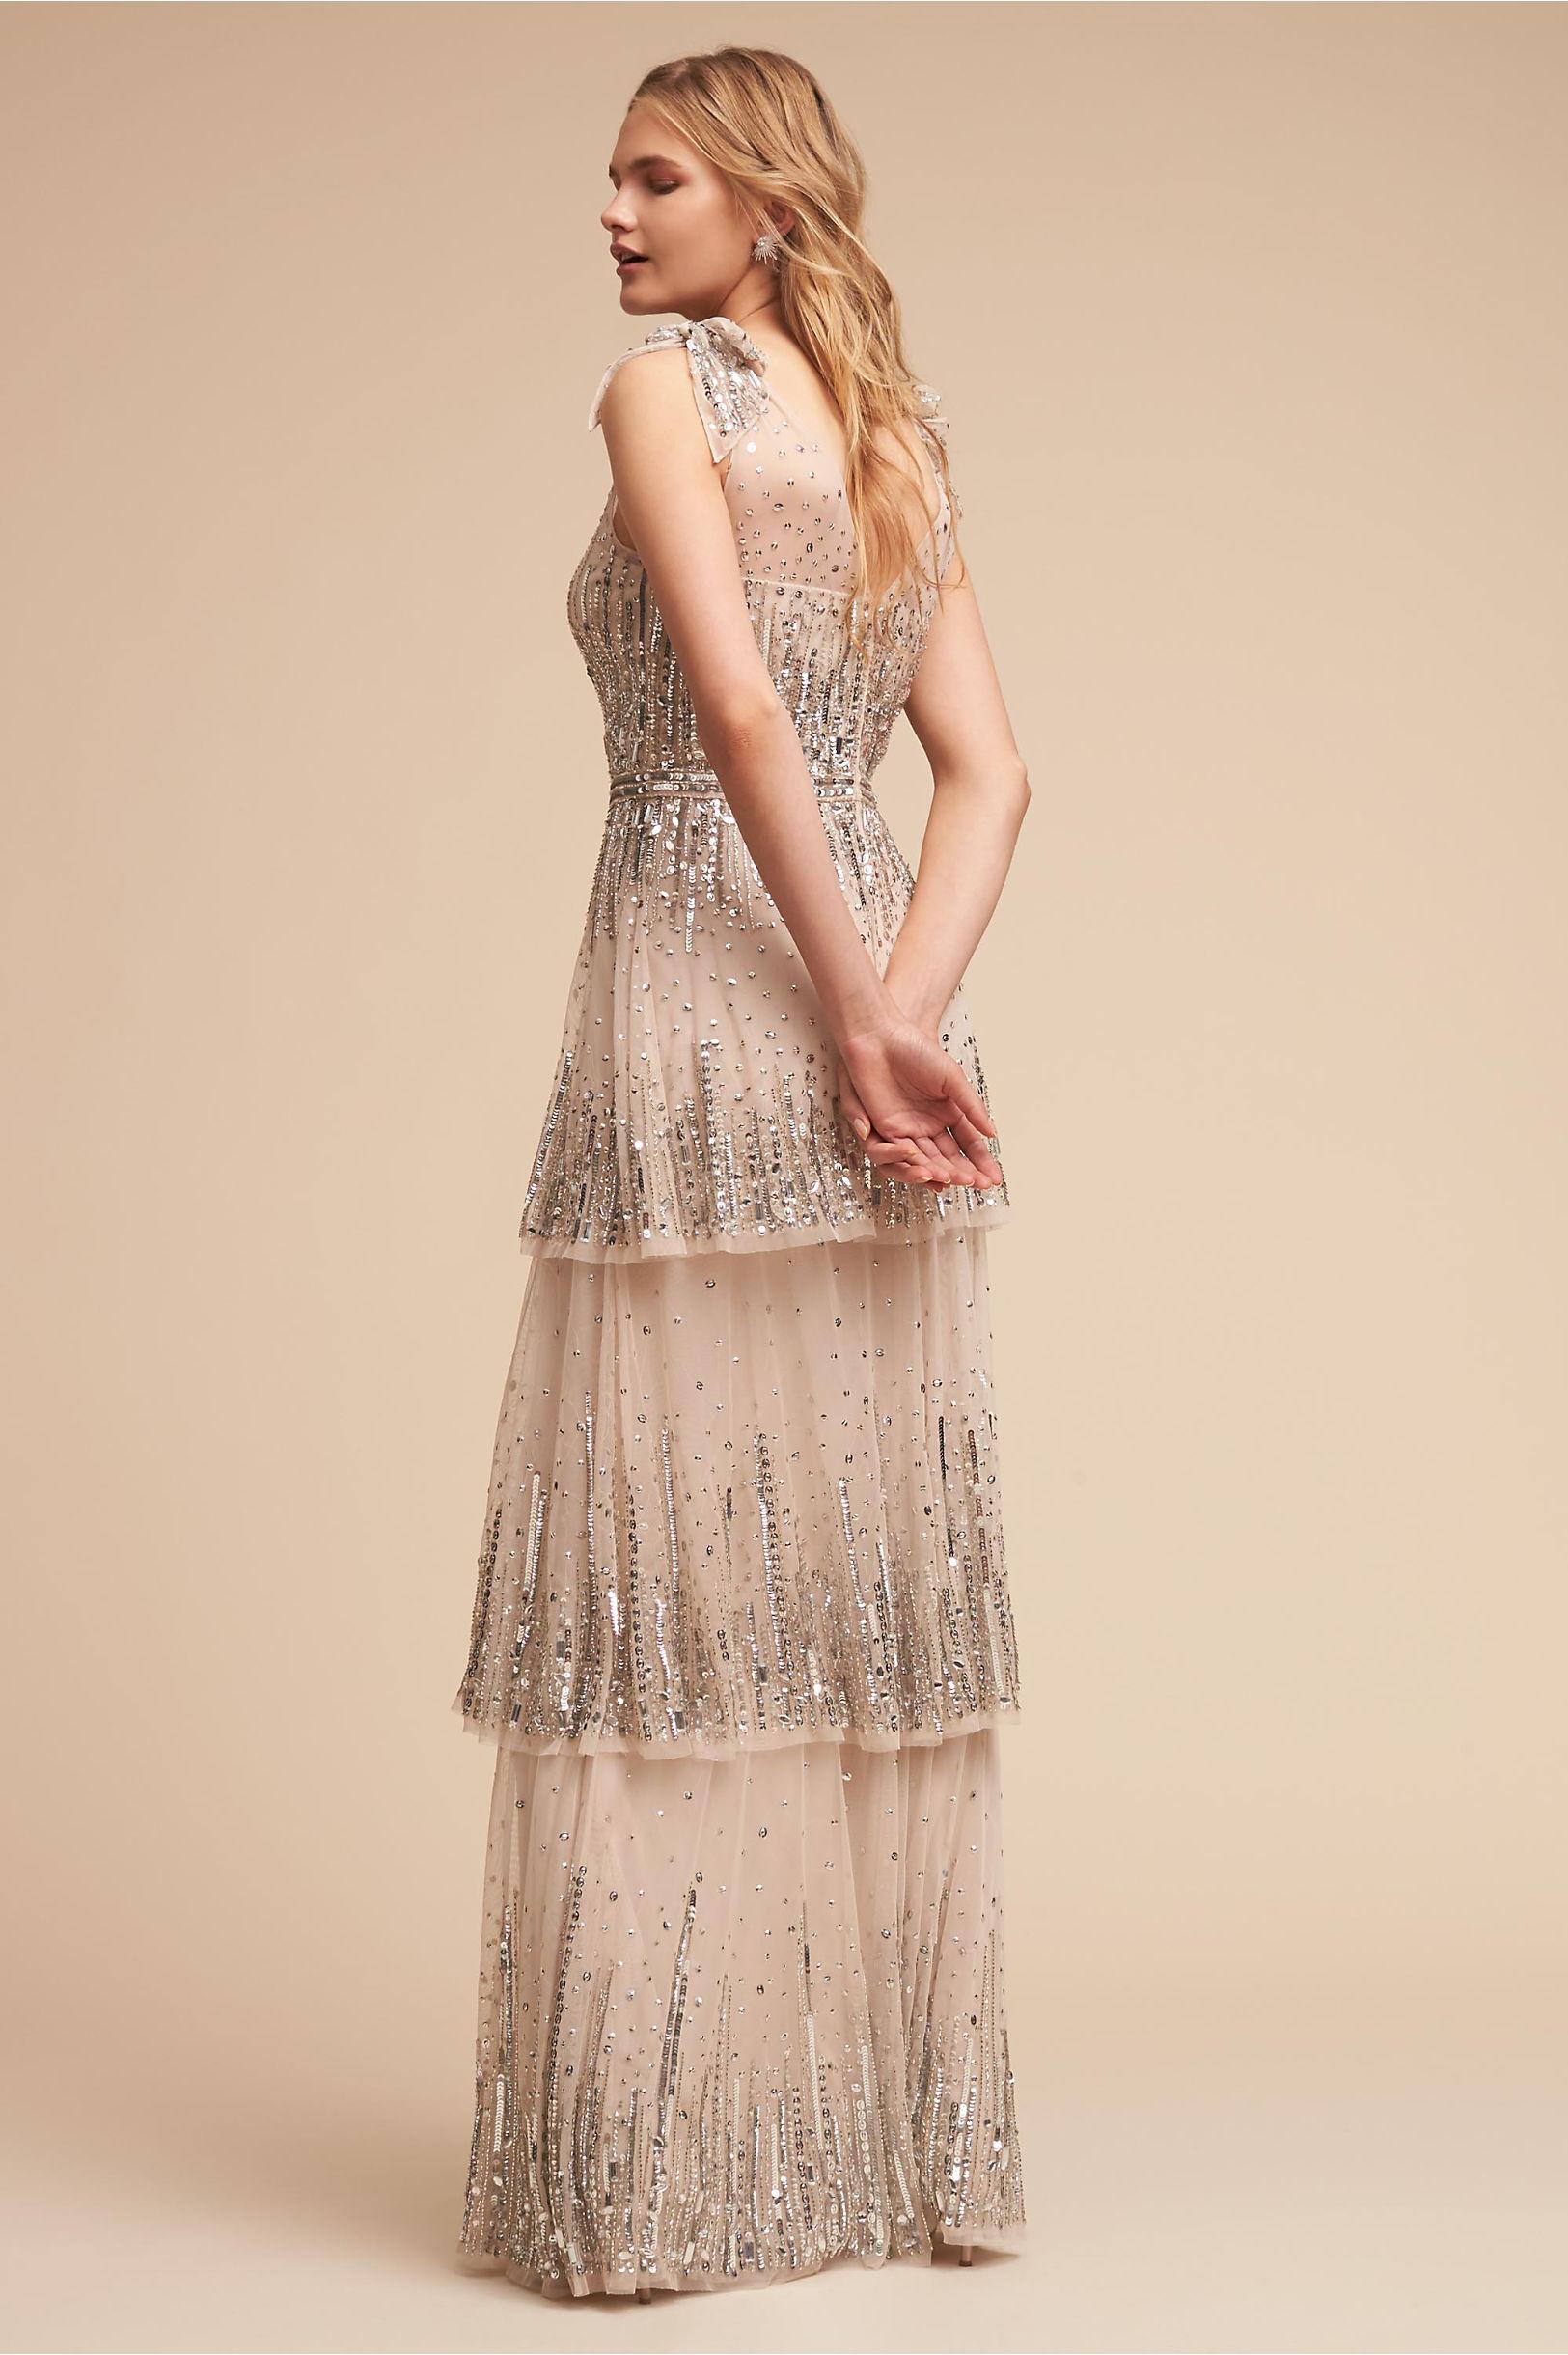 Woodsen Gown in Sale | BHLDN